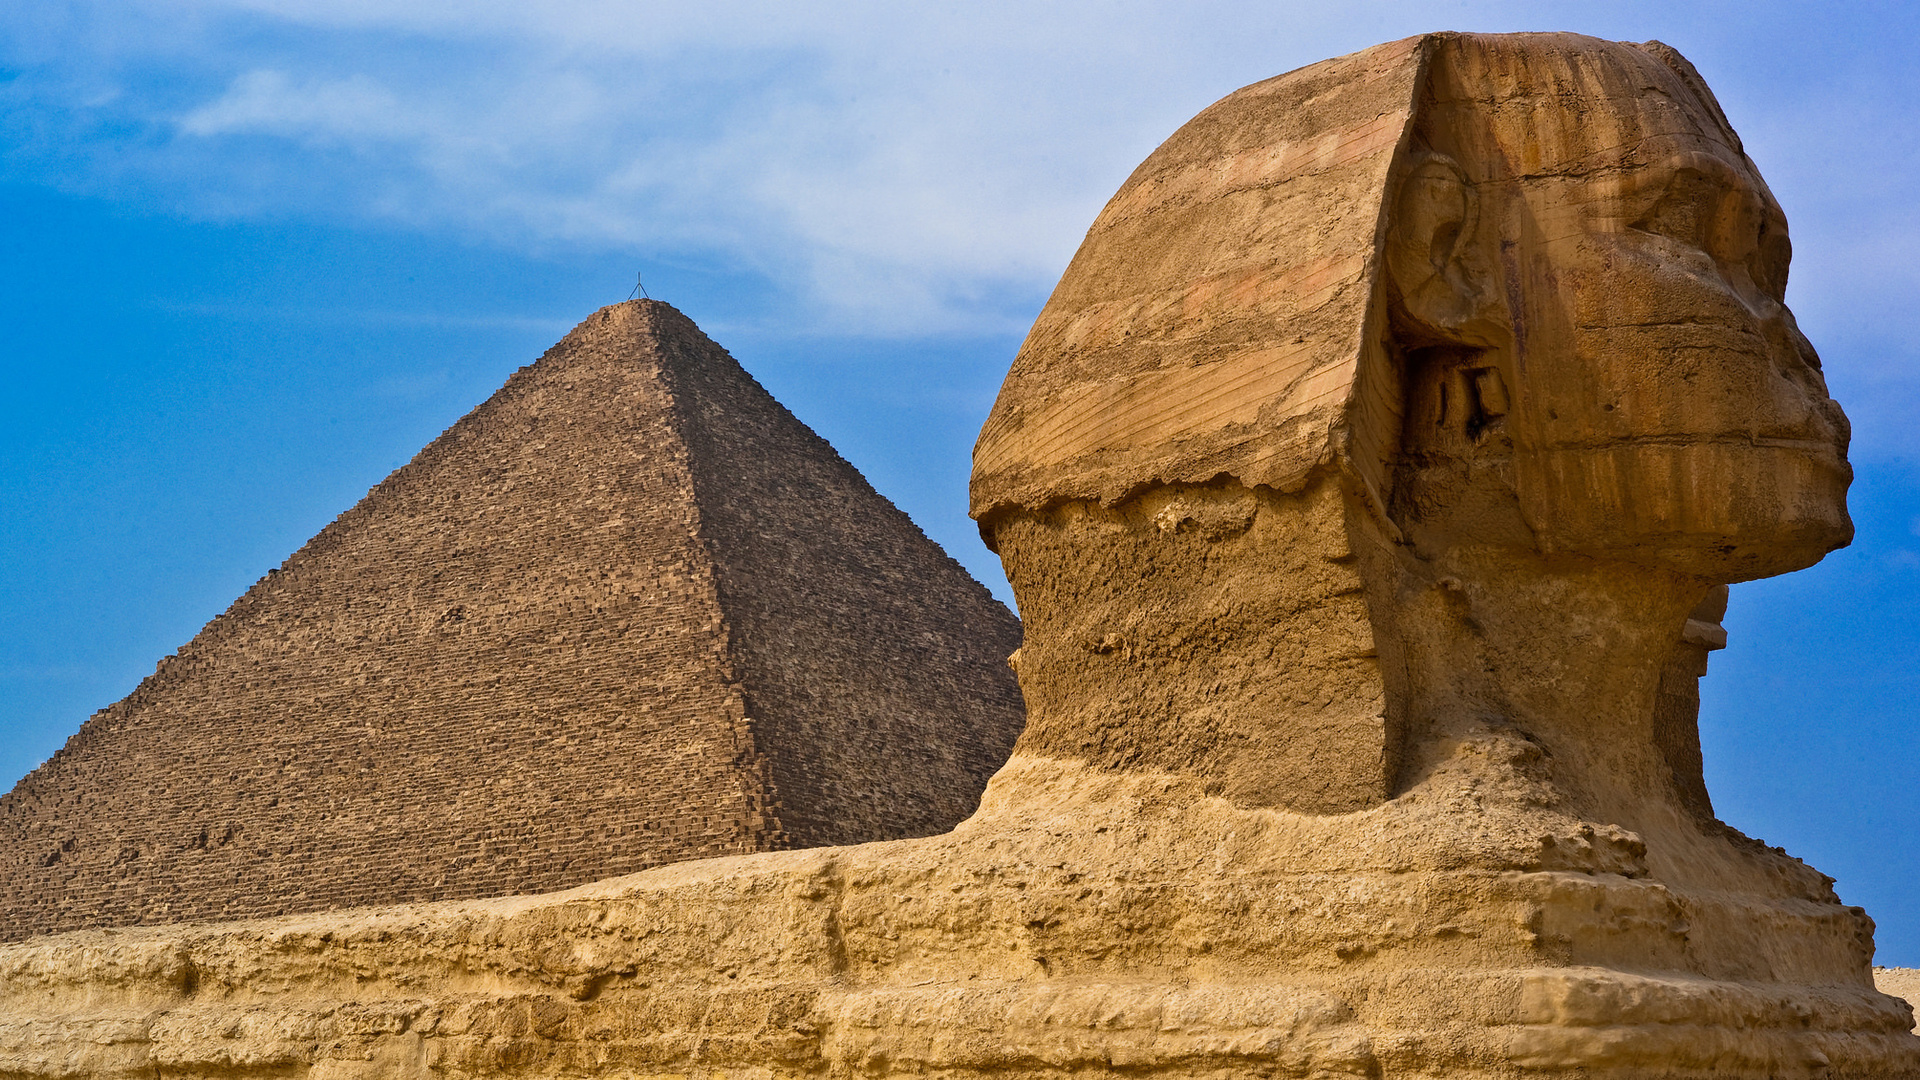 картинки пирамиды египта формы помешали